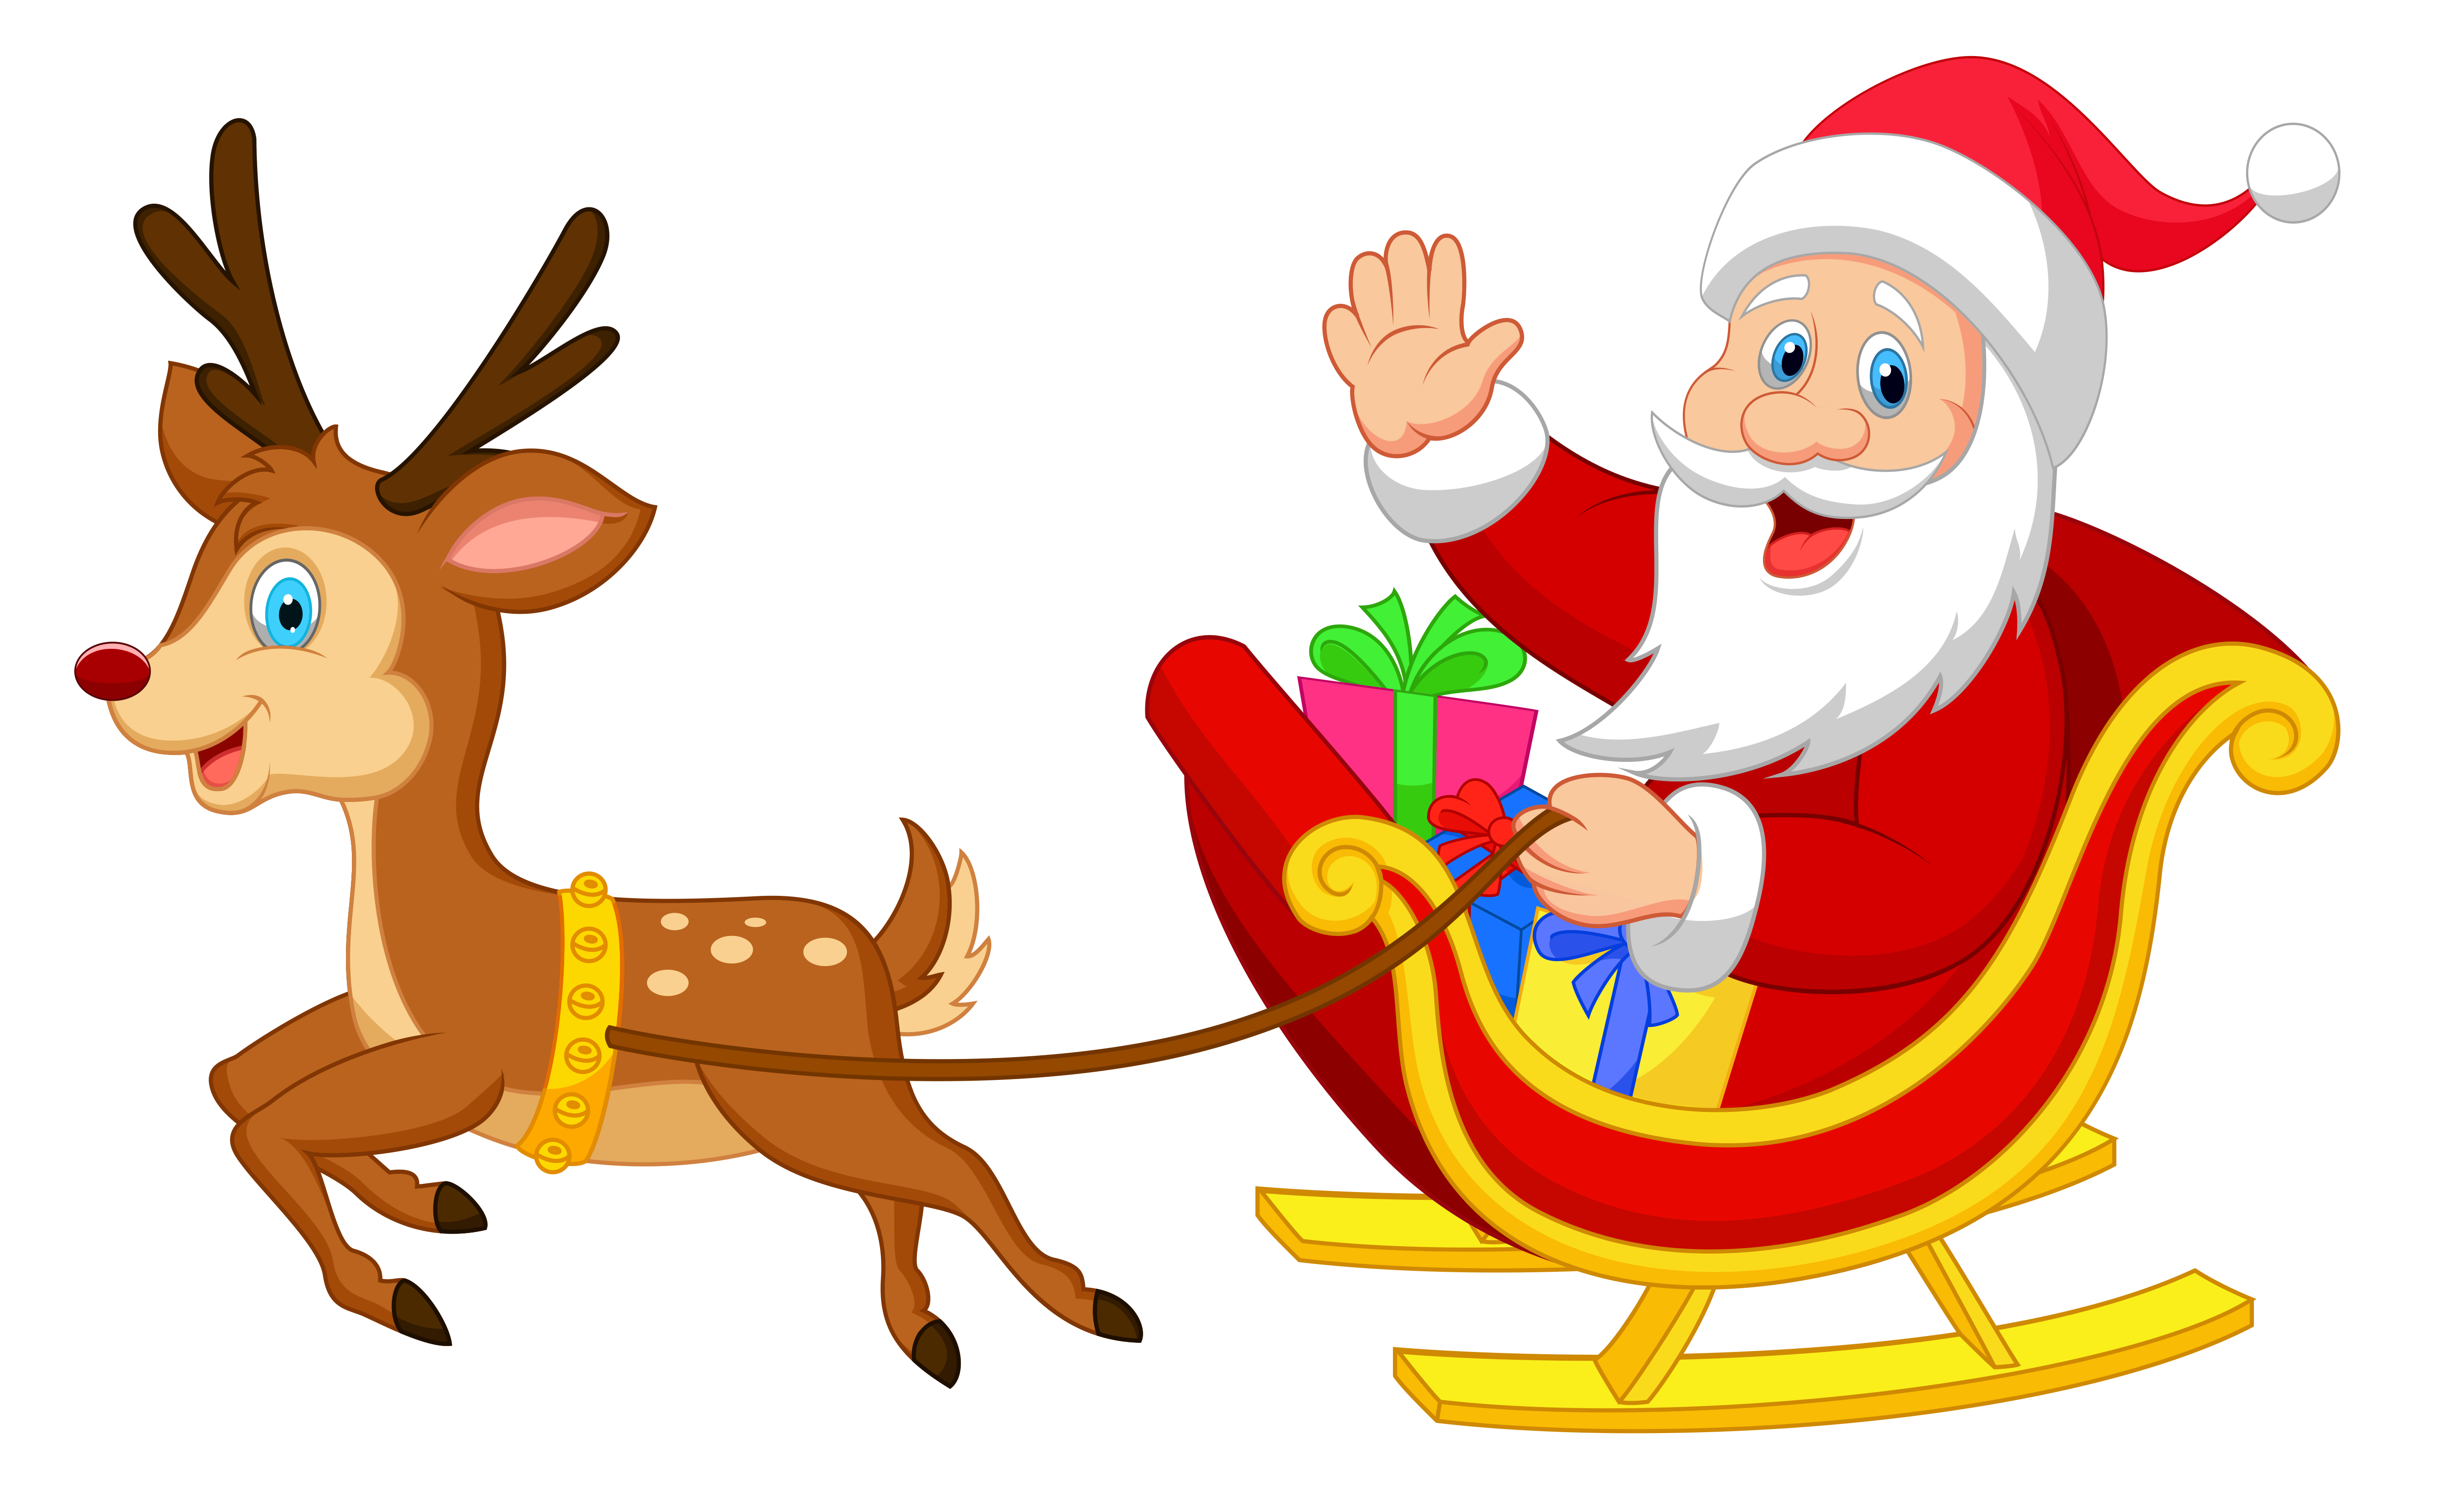 santa and his reindeer clipart at getdrawings com free for rh getdrawings com santa sleigh clipart png santa in his sleigh clipart